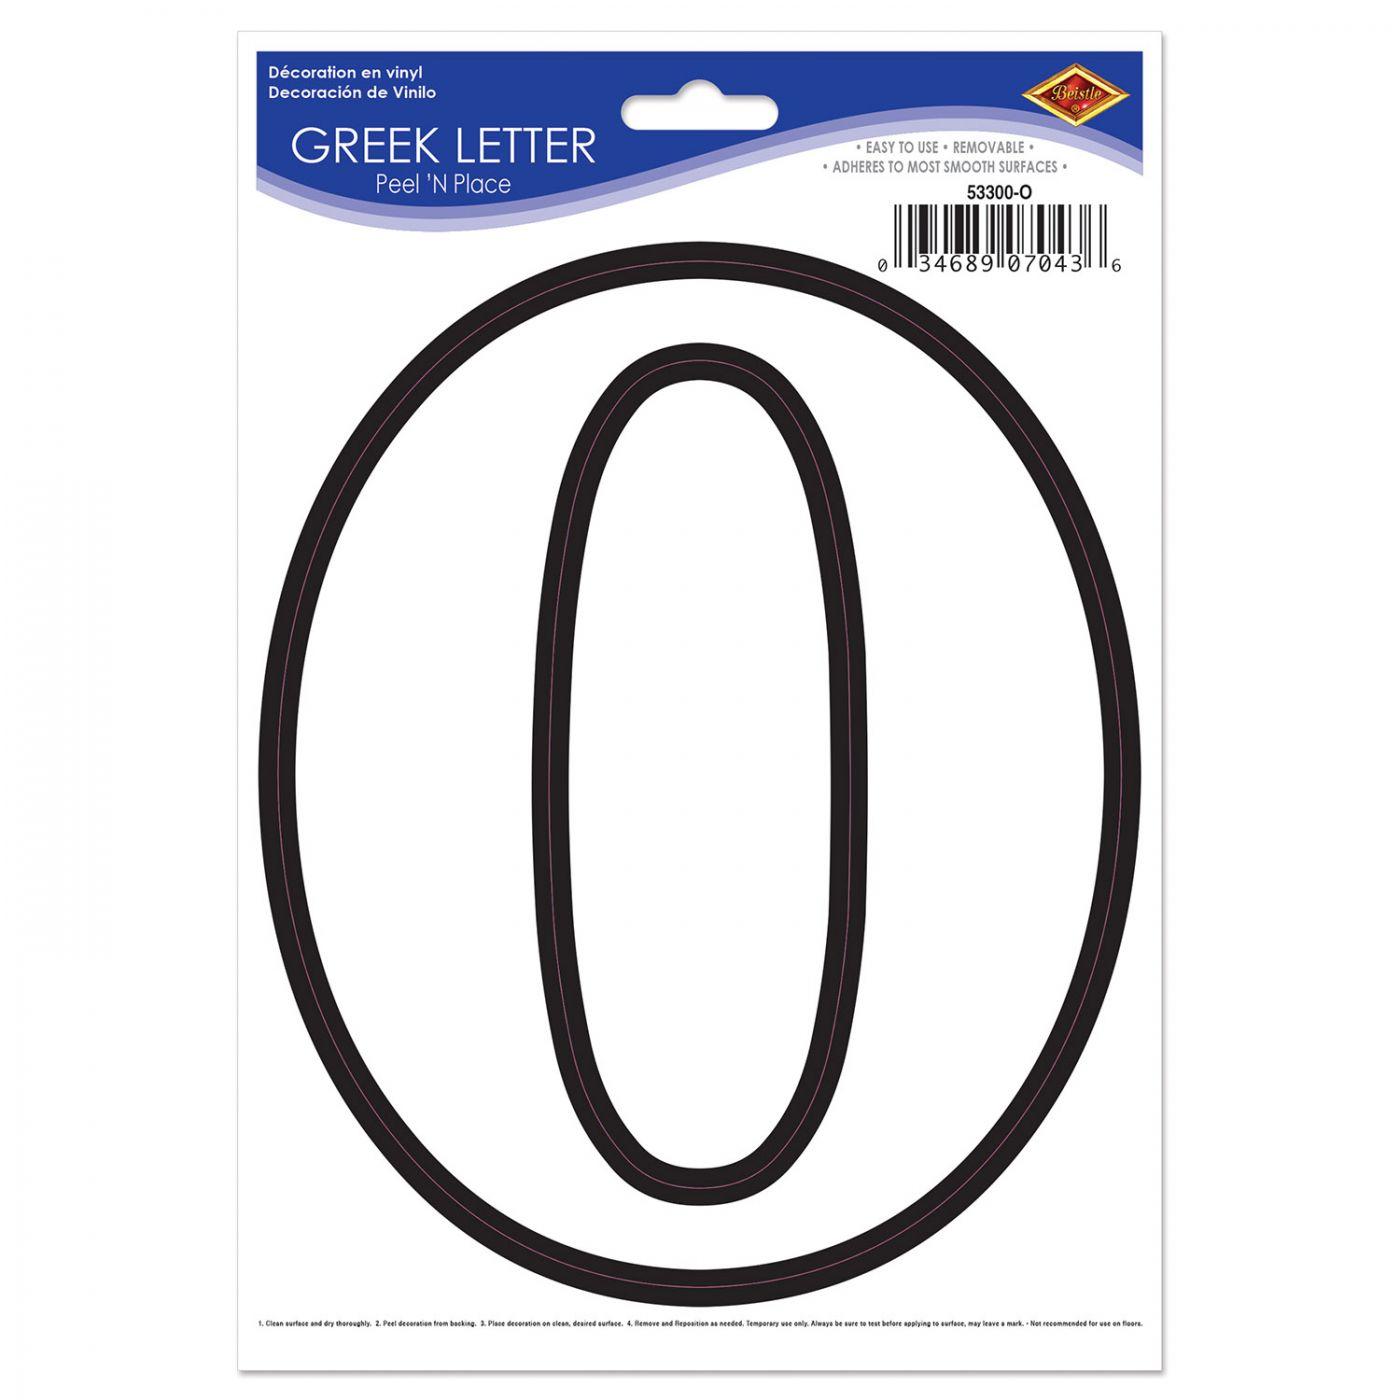 Greek Letter Peel 'N Place image